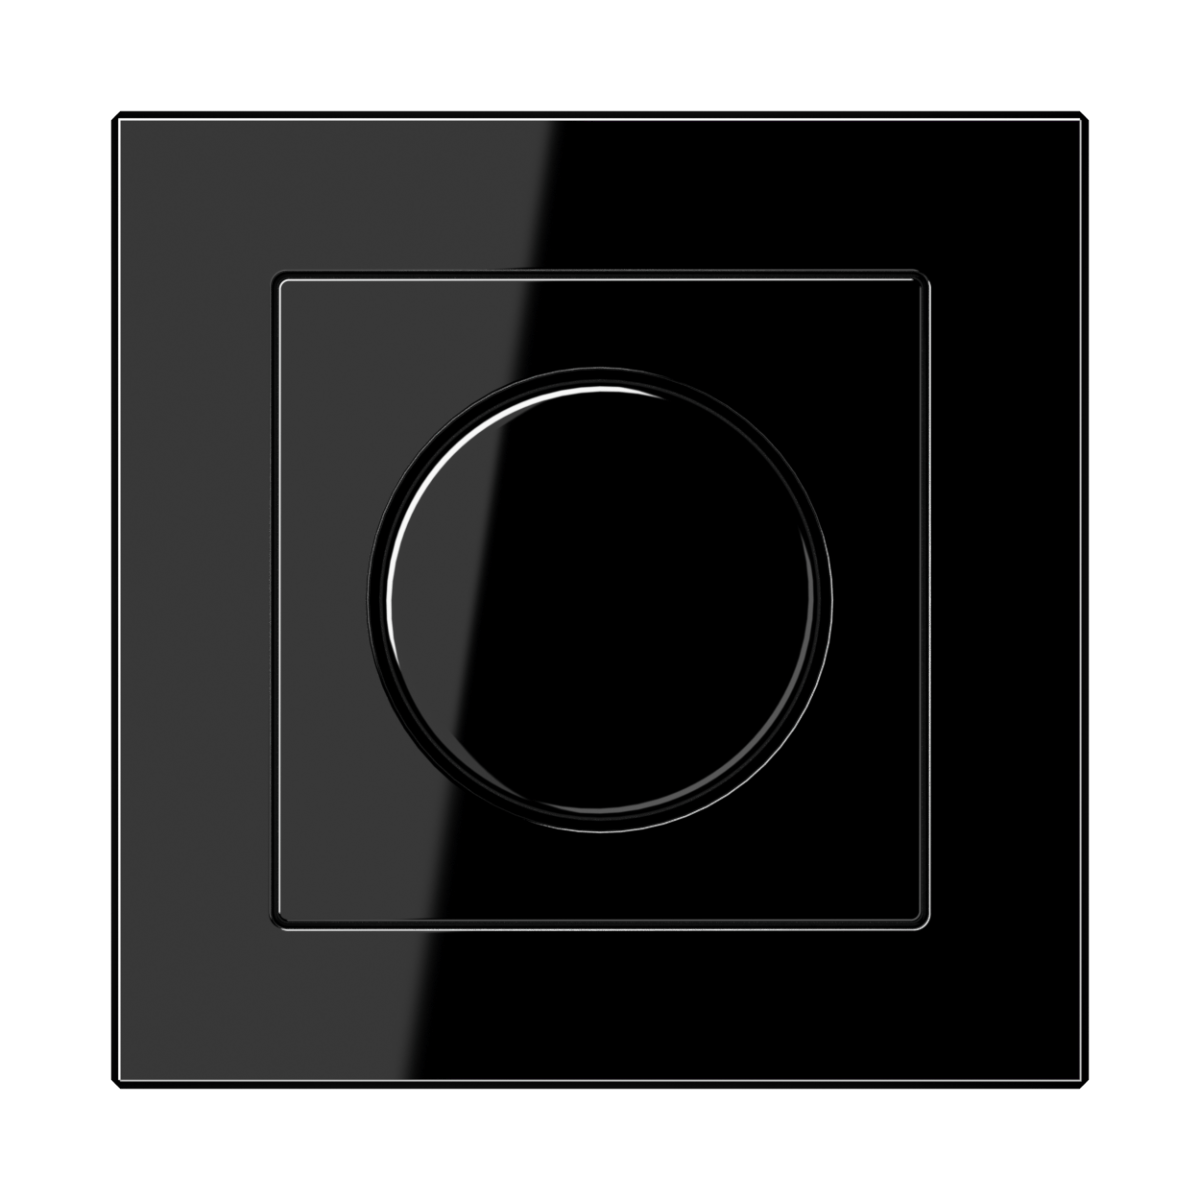 Variasi A Creation Black  LightingInterior LightingCeiling Lamps 13